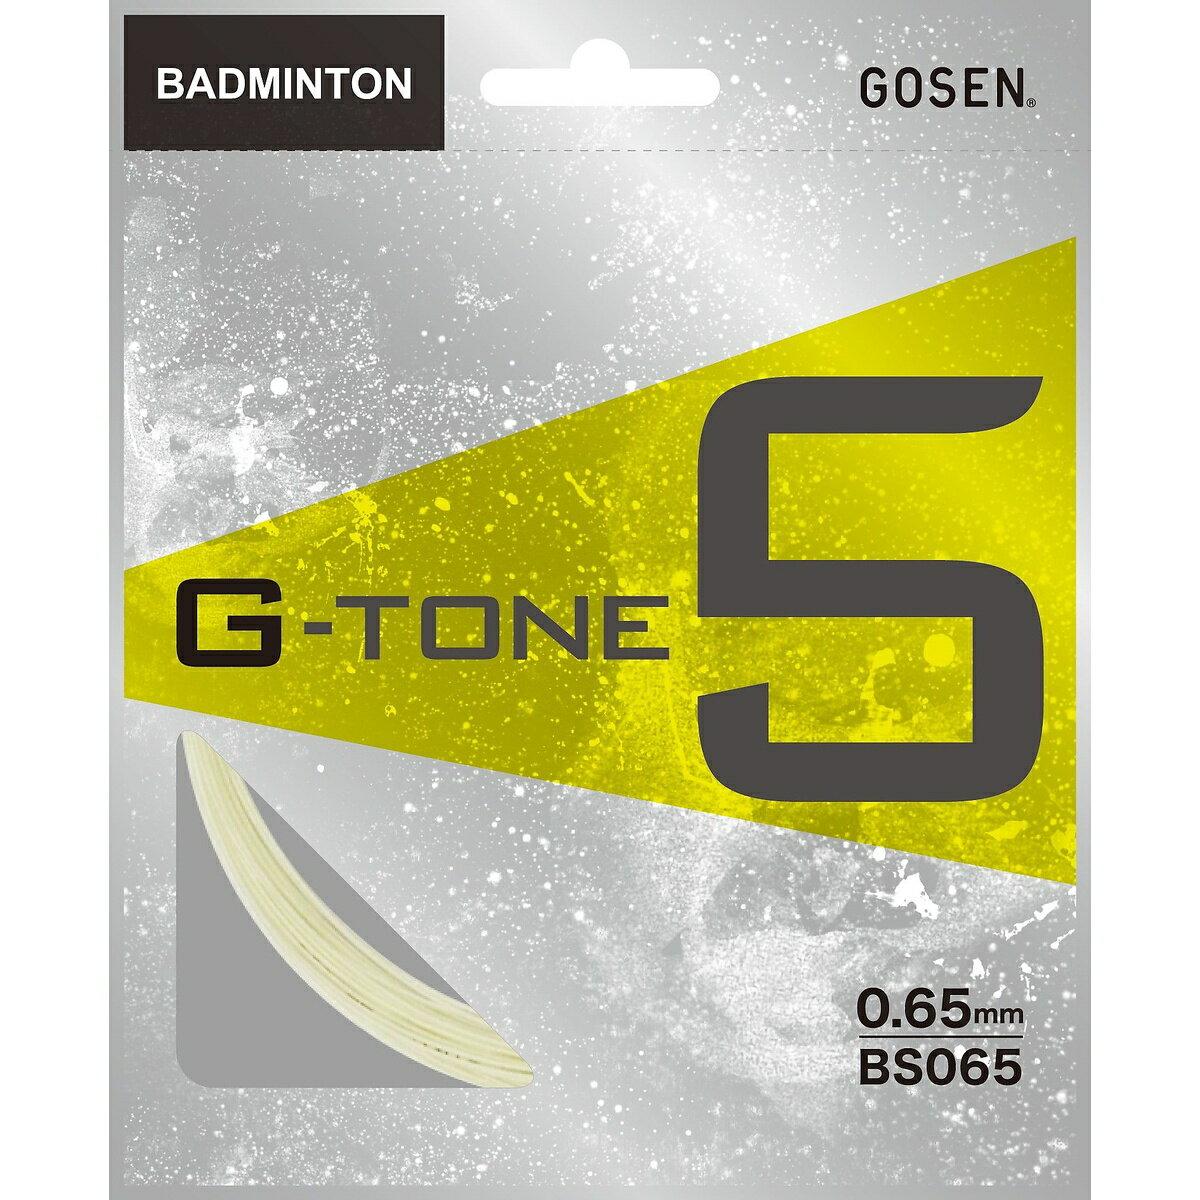 GOSEN (ゴーセン) バドミントン ストリングス G−TONE 5 オレンジ BS065OR画像